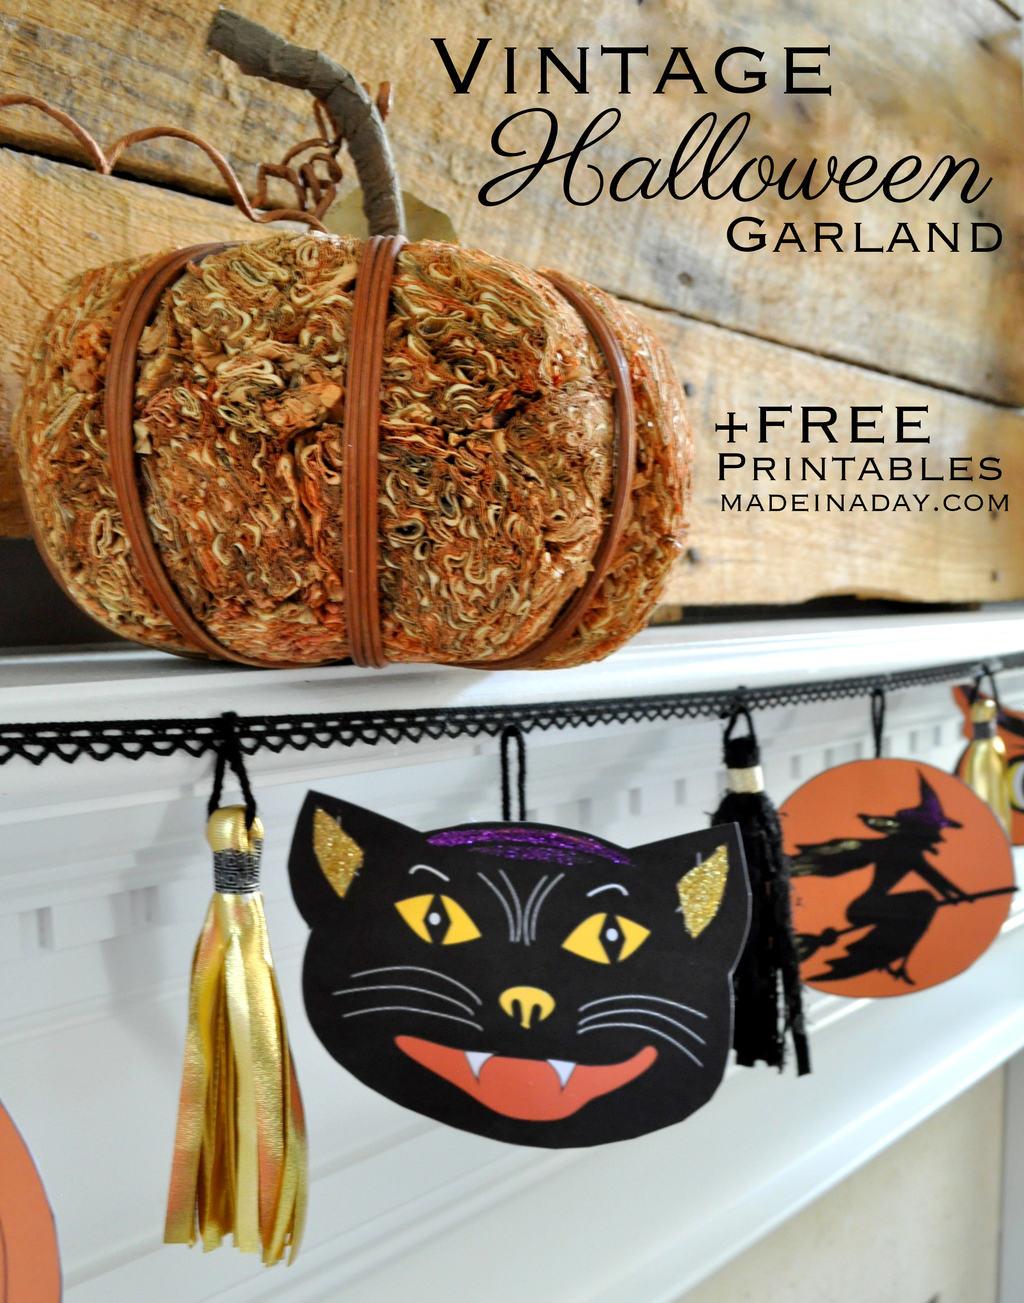 Vintage Halloween Printable Garland - Free Printable Vintage Halloween Images